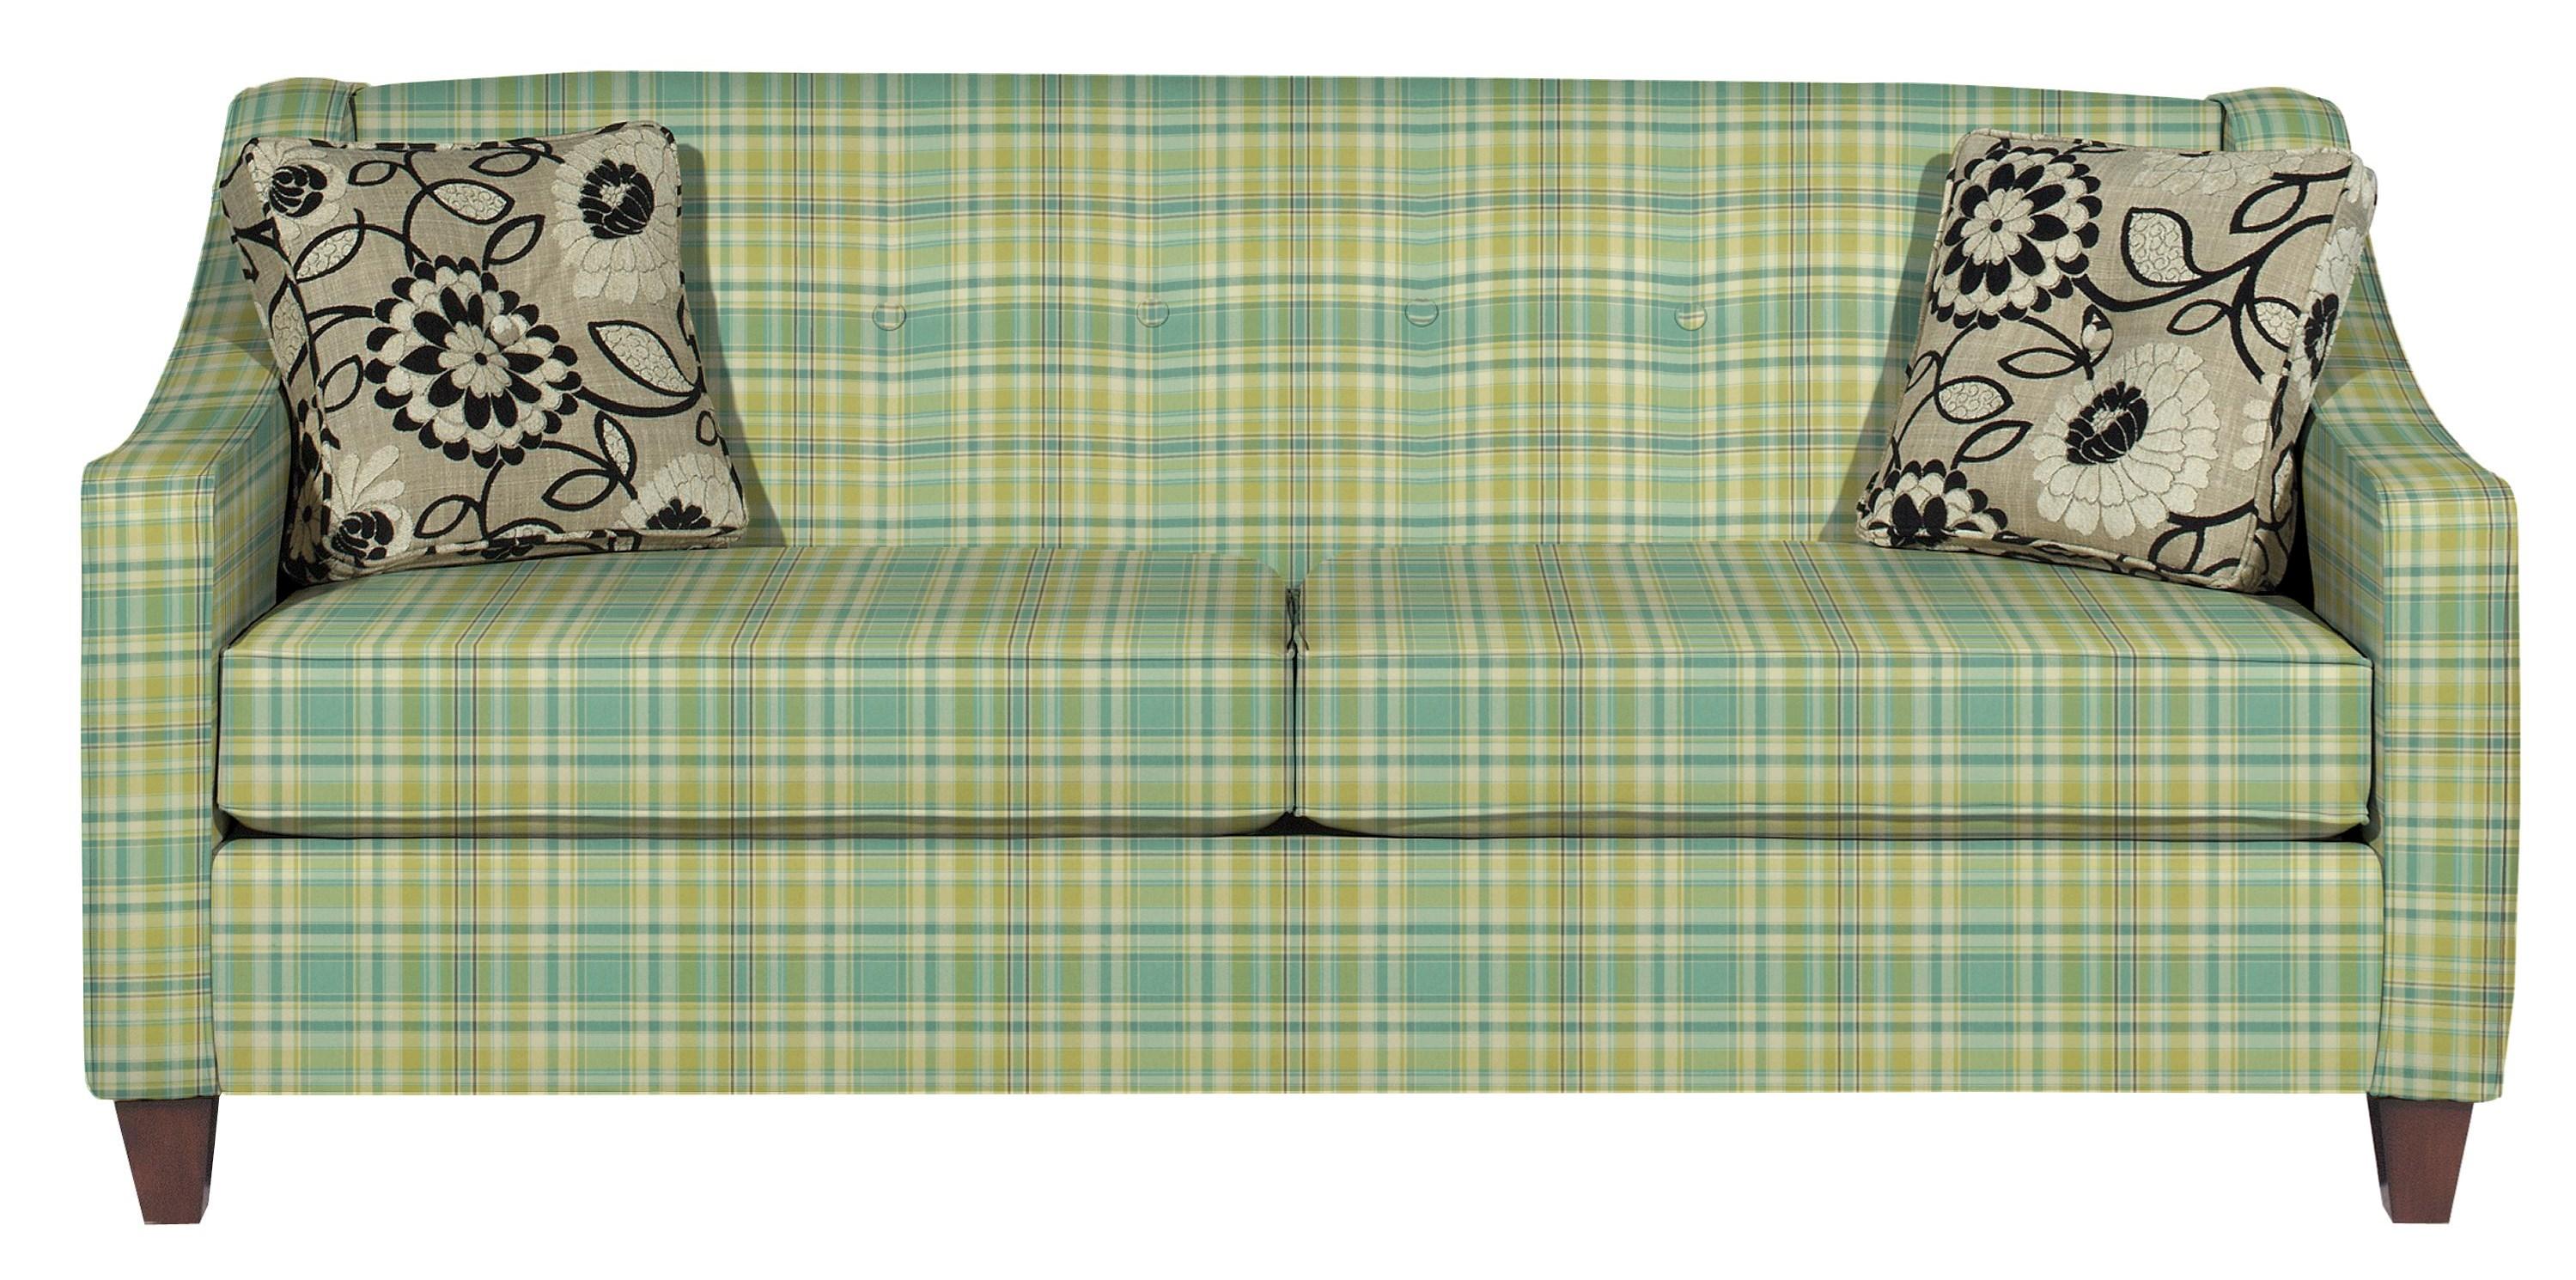 Craftmaster 7069 Sofa - Item Number: 706950-ABERNATHY-21